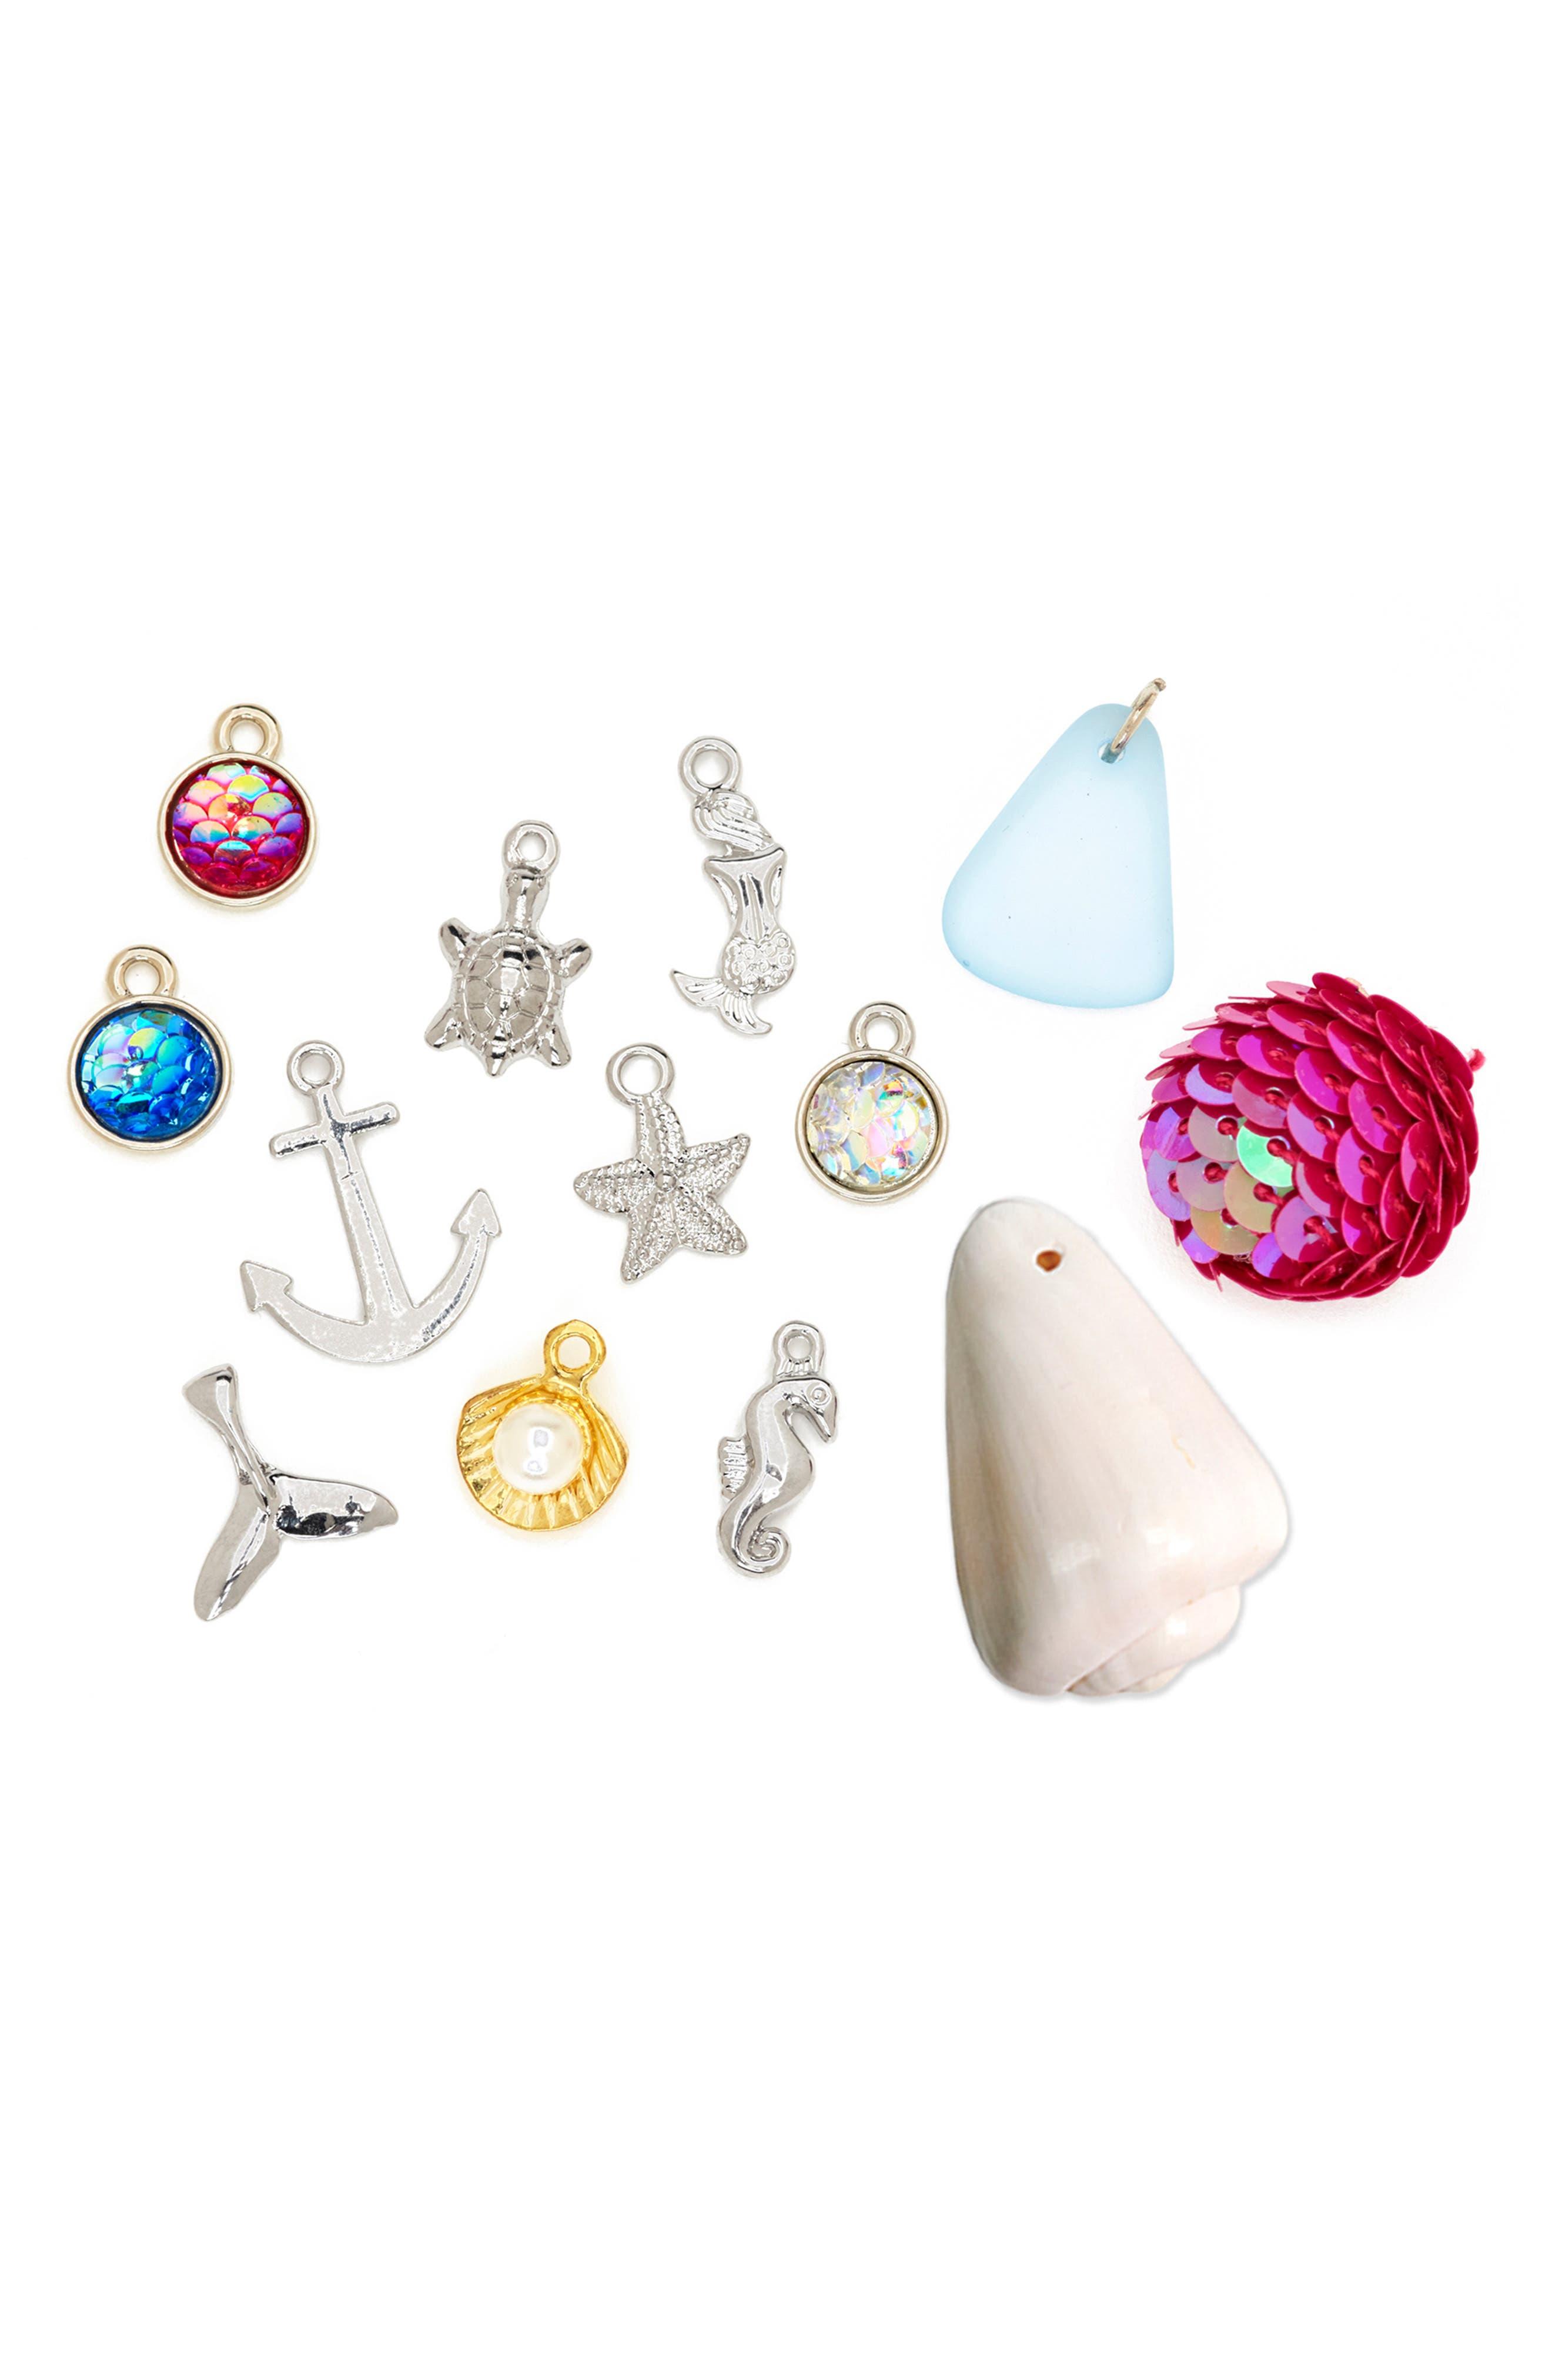 Mermaid Tail Jewelry Maker,                             Alternate thumbnail 5, color,                             450